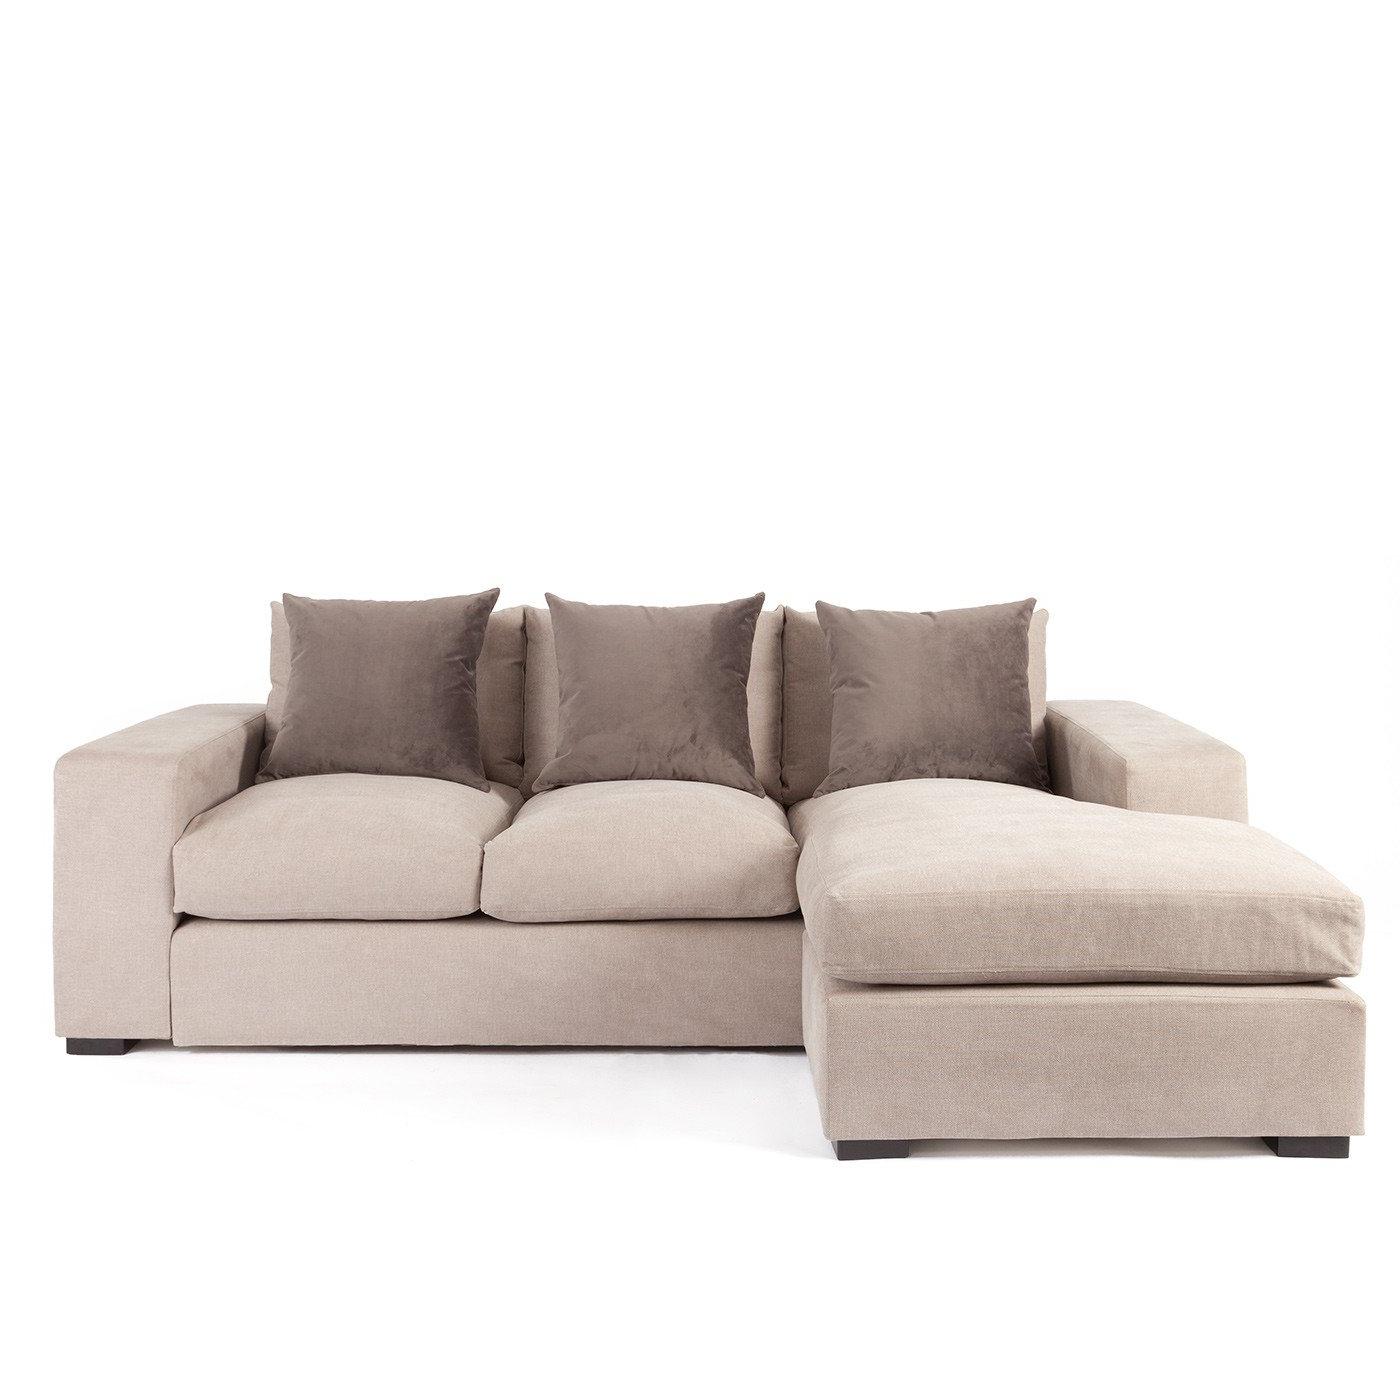 4 Seat Sofas Inside 2019 Manhattan Sofa Bed – Raft Furniture, London (View 14 of 20)